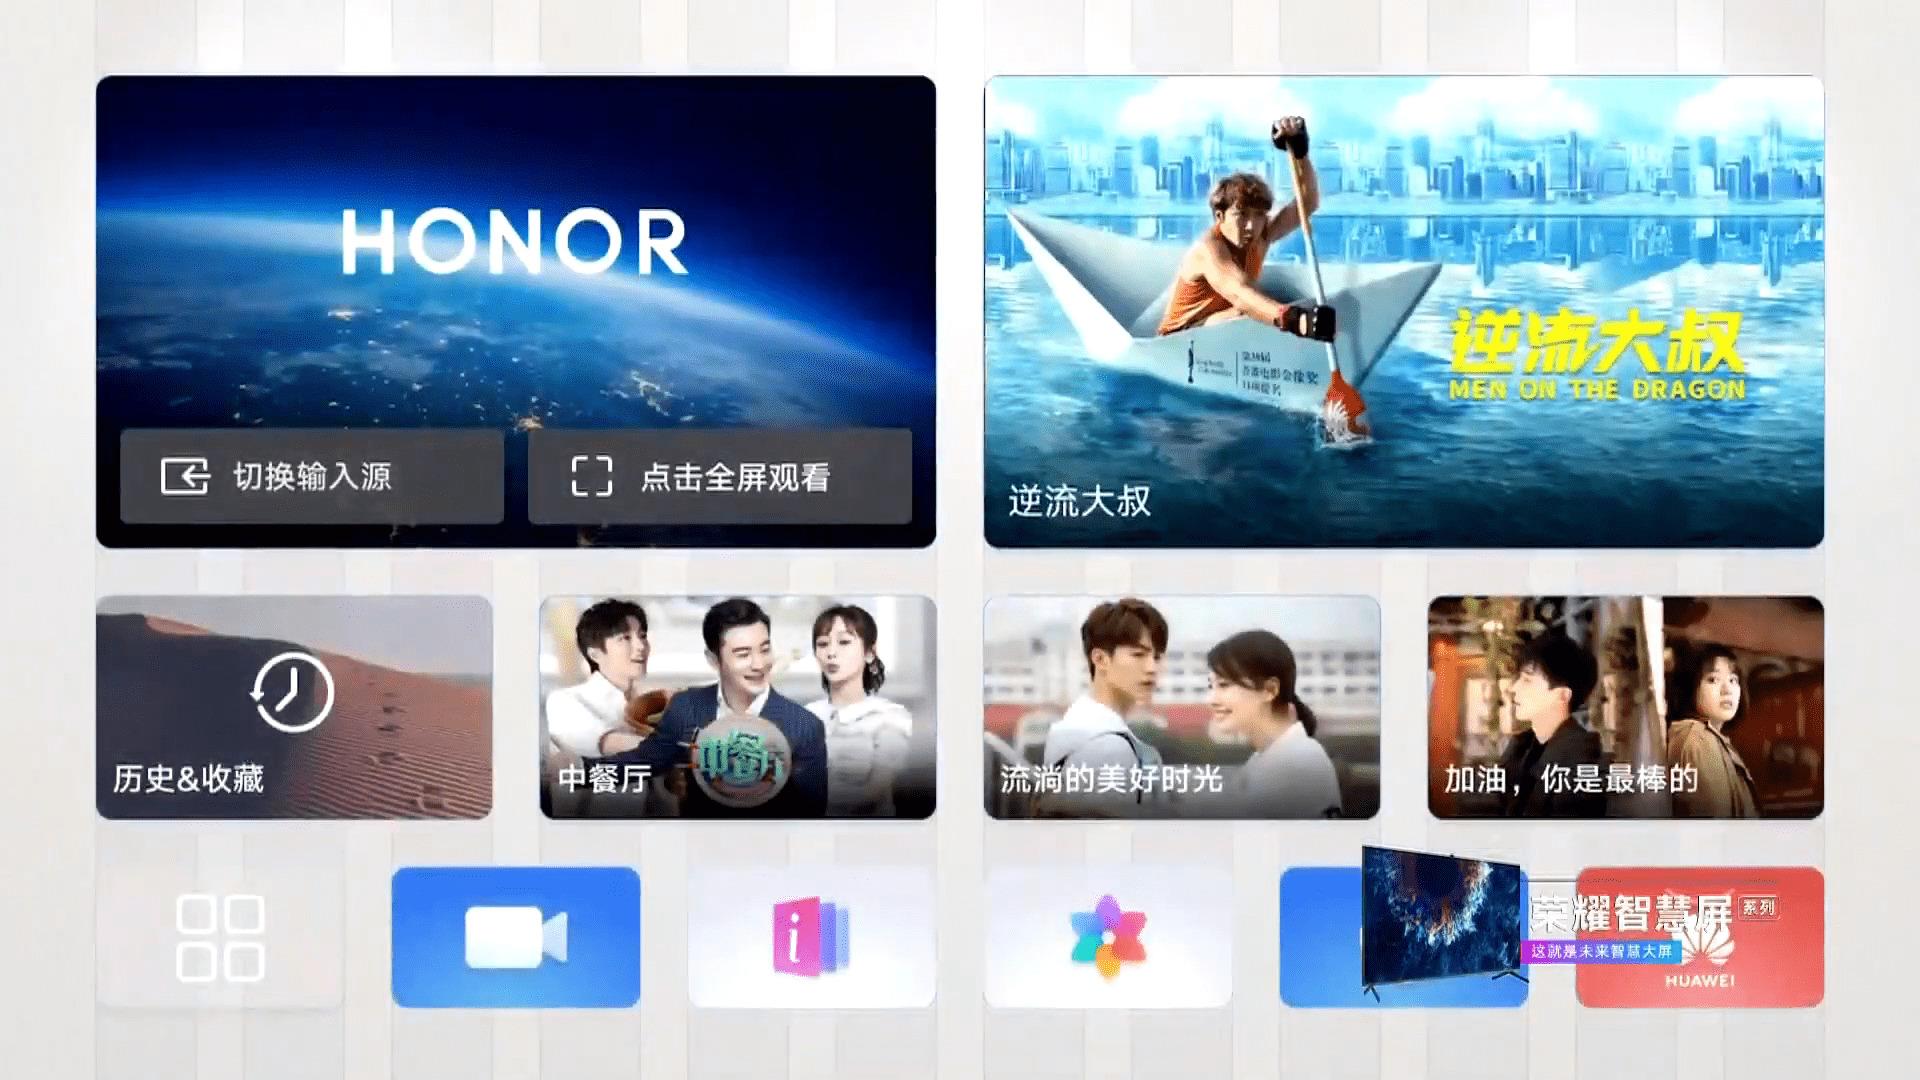 Honor Vision : la marque de Huawei lance sa première TV sous HarmonyOS